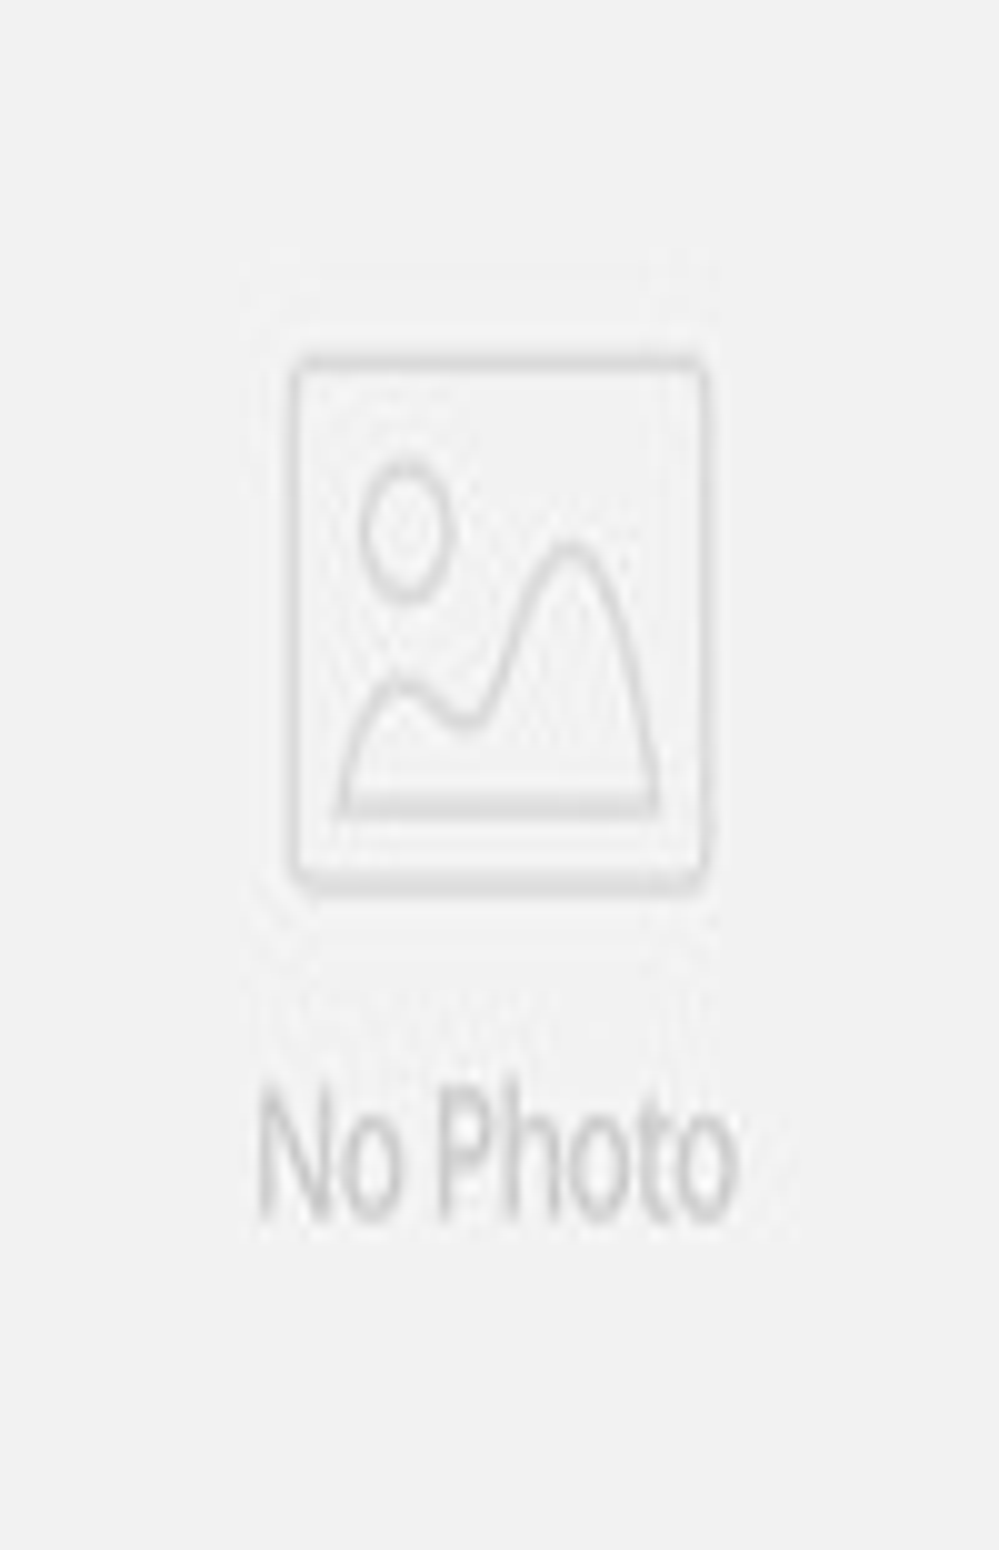 Plus Size Wedding Dress For Rent Dress Blog Edin